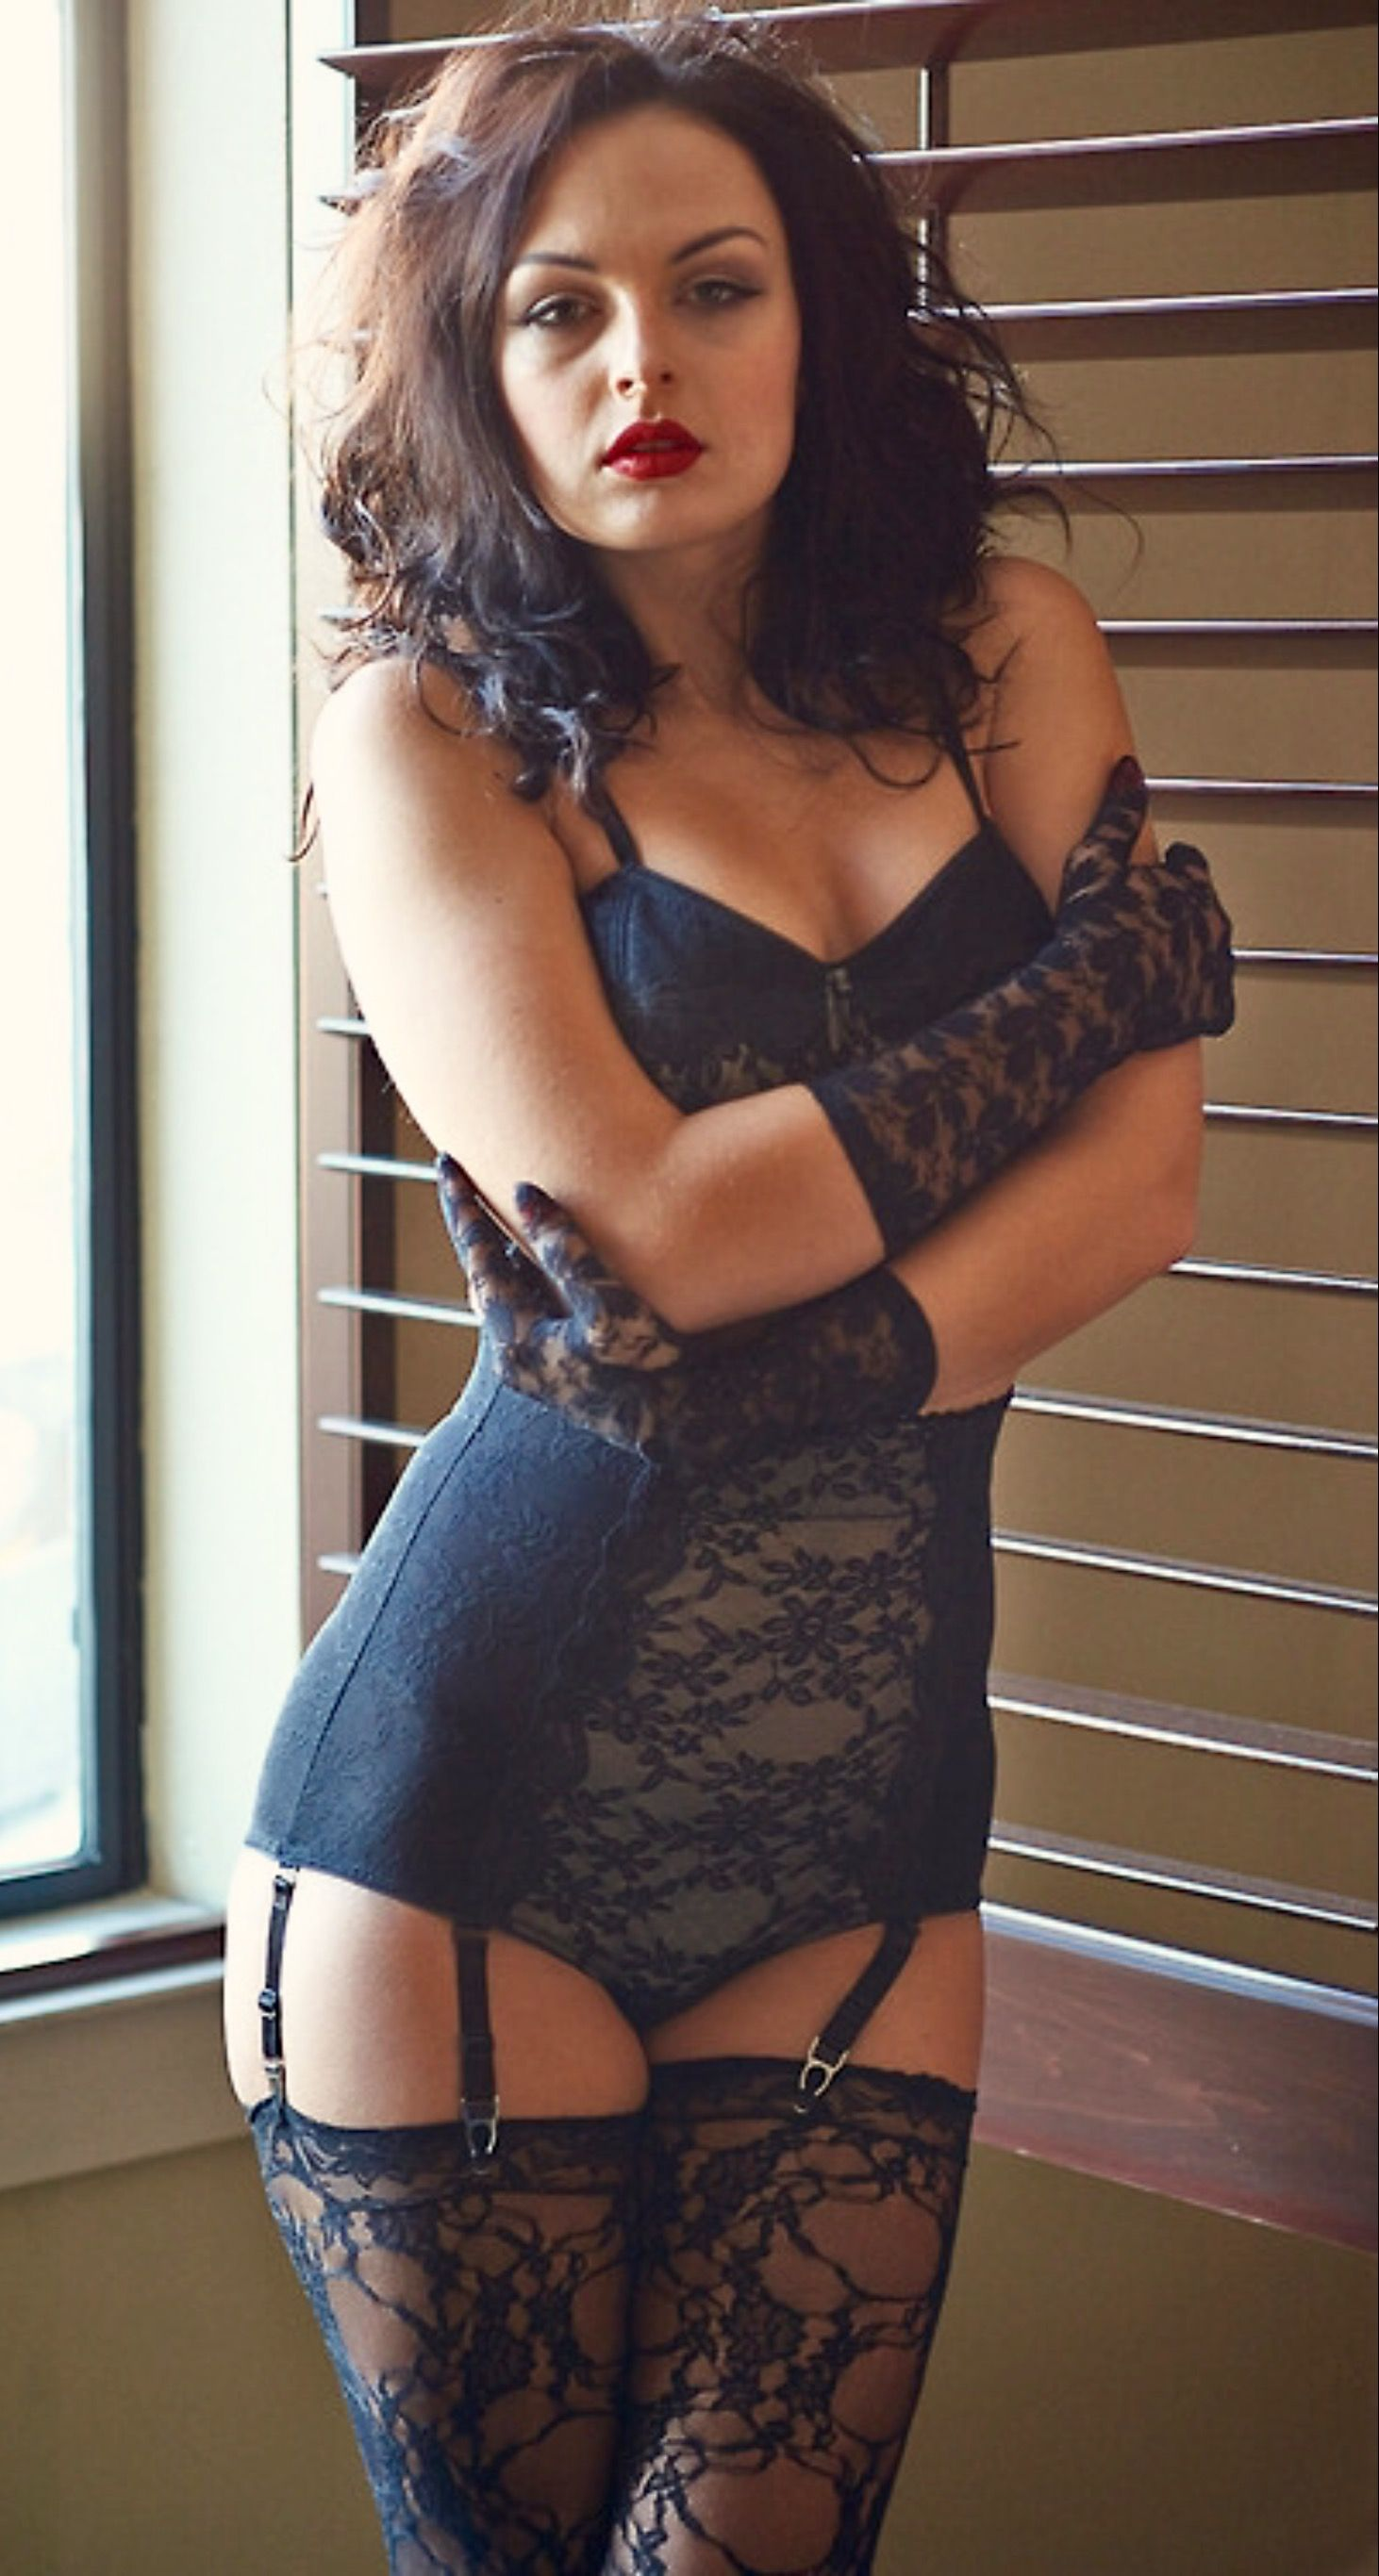 milf lingerie | maduras gostosas | pinterest | pantyhose heels, sexy